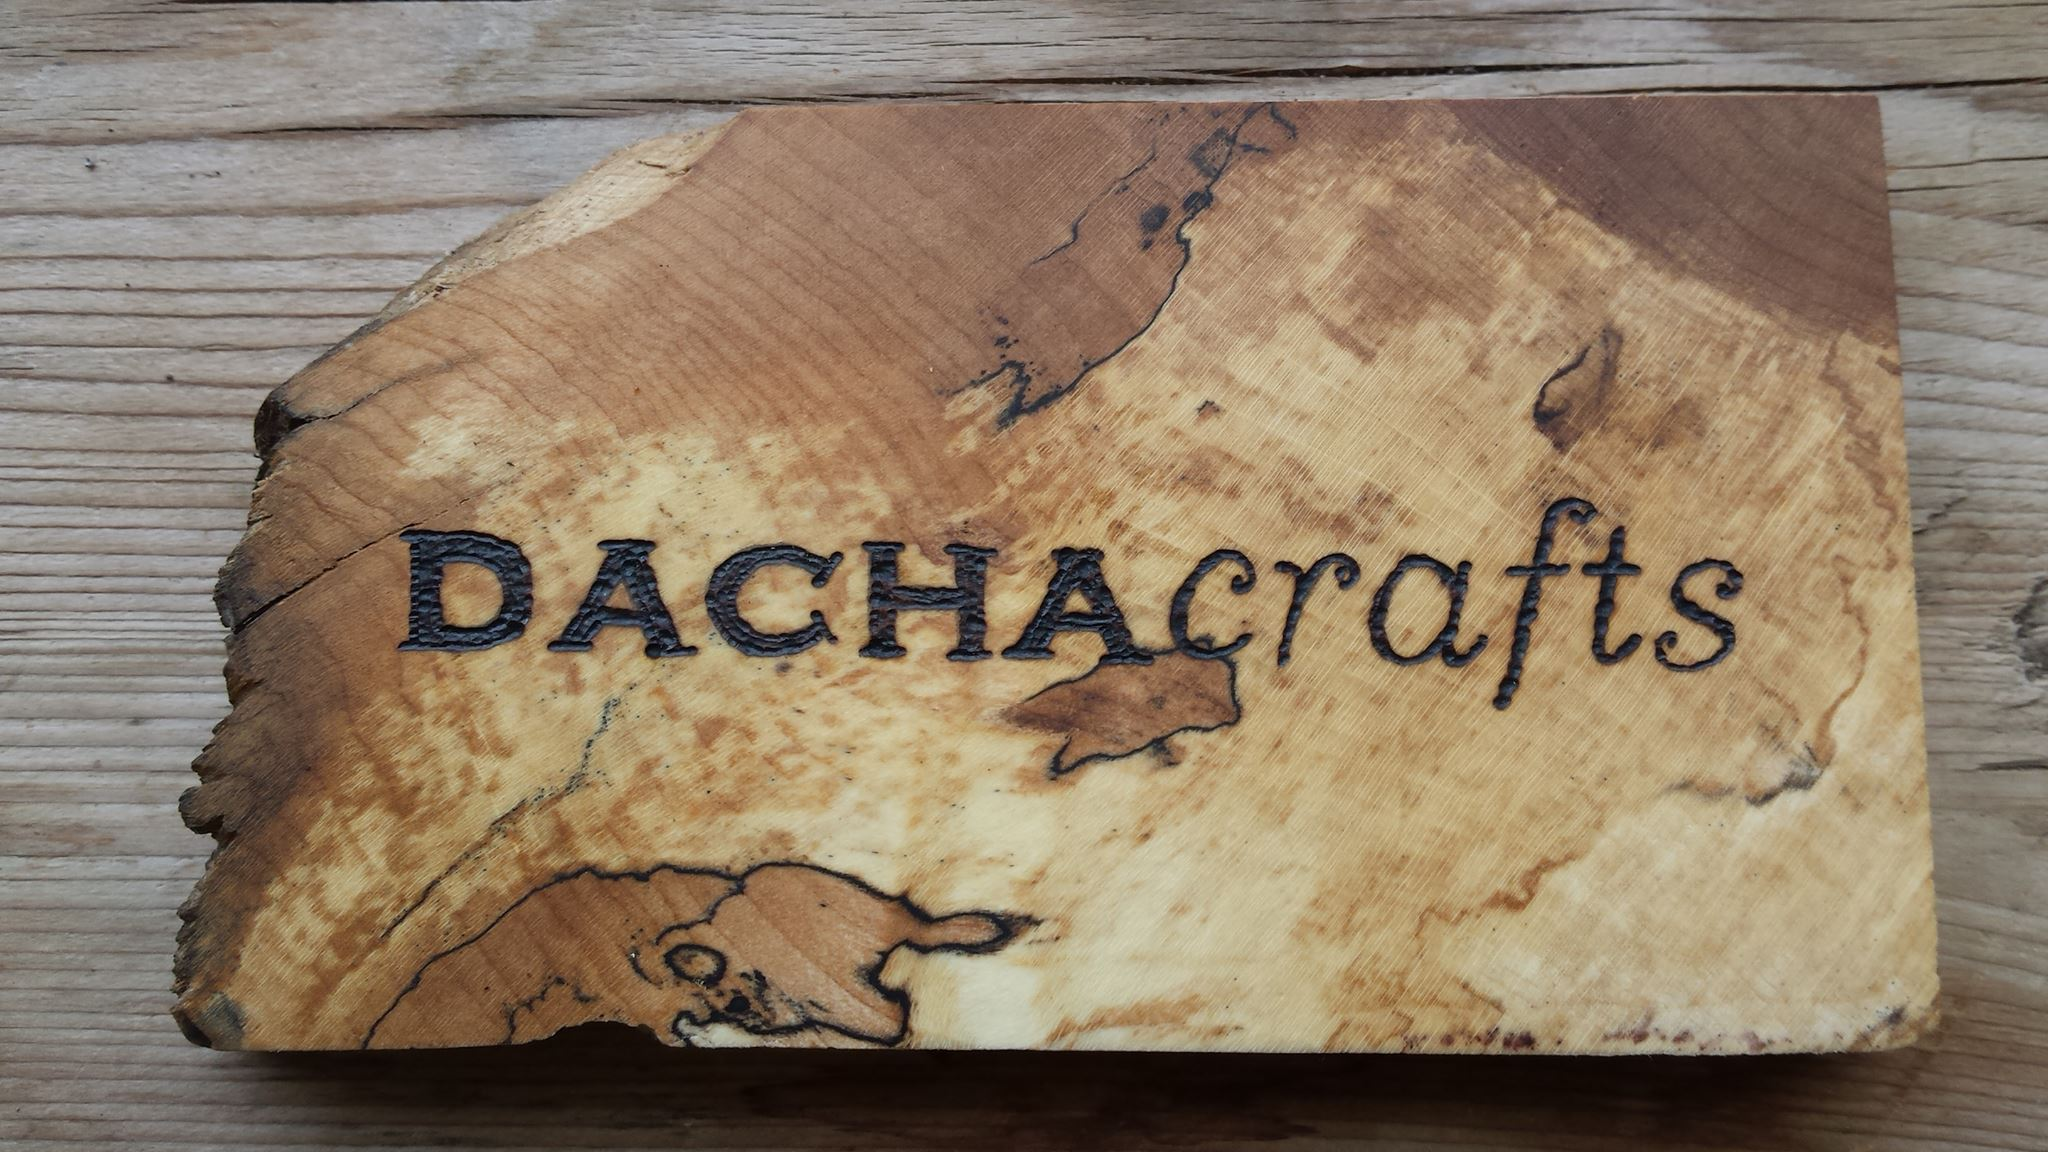 dachacrafts 2